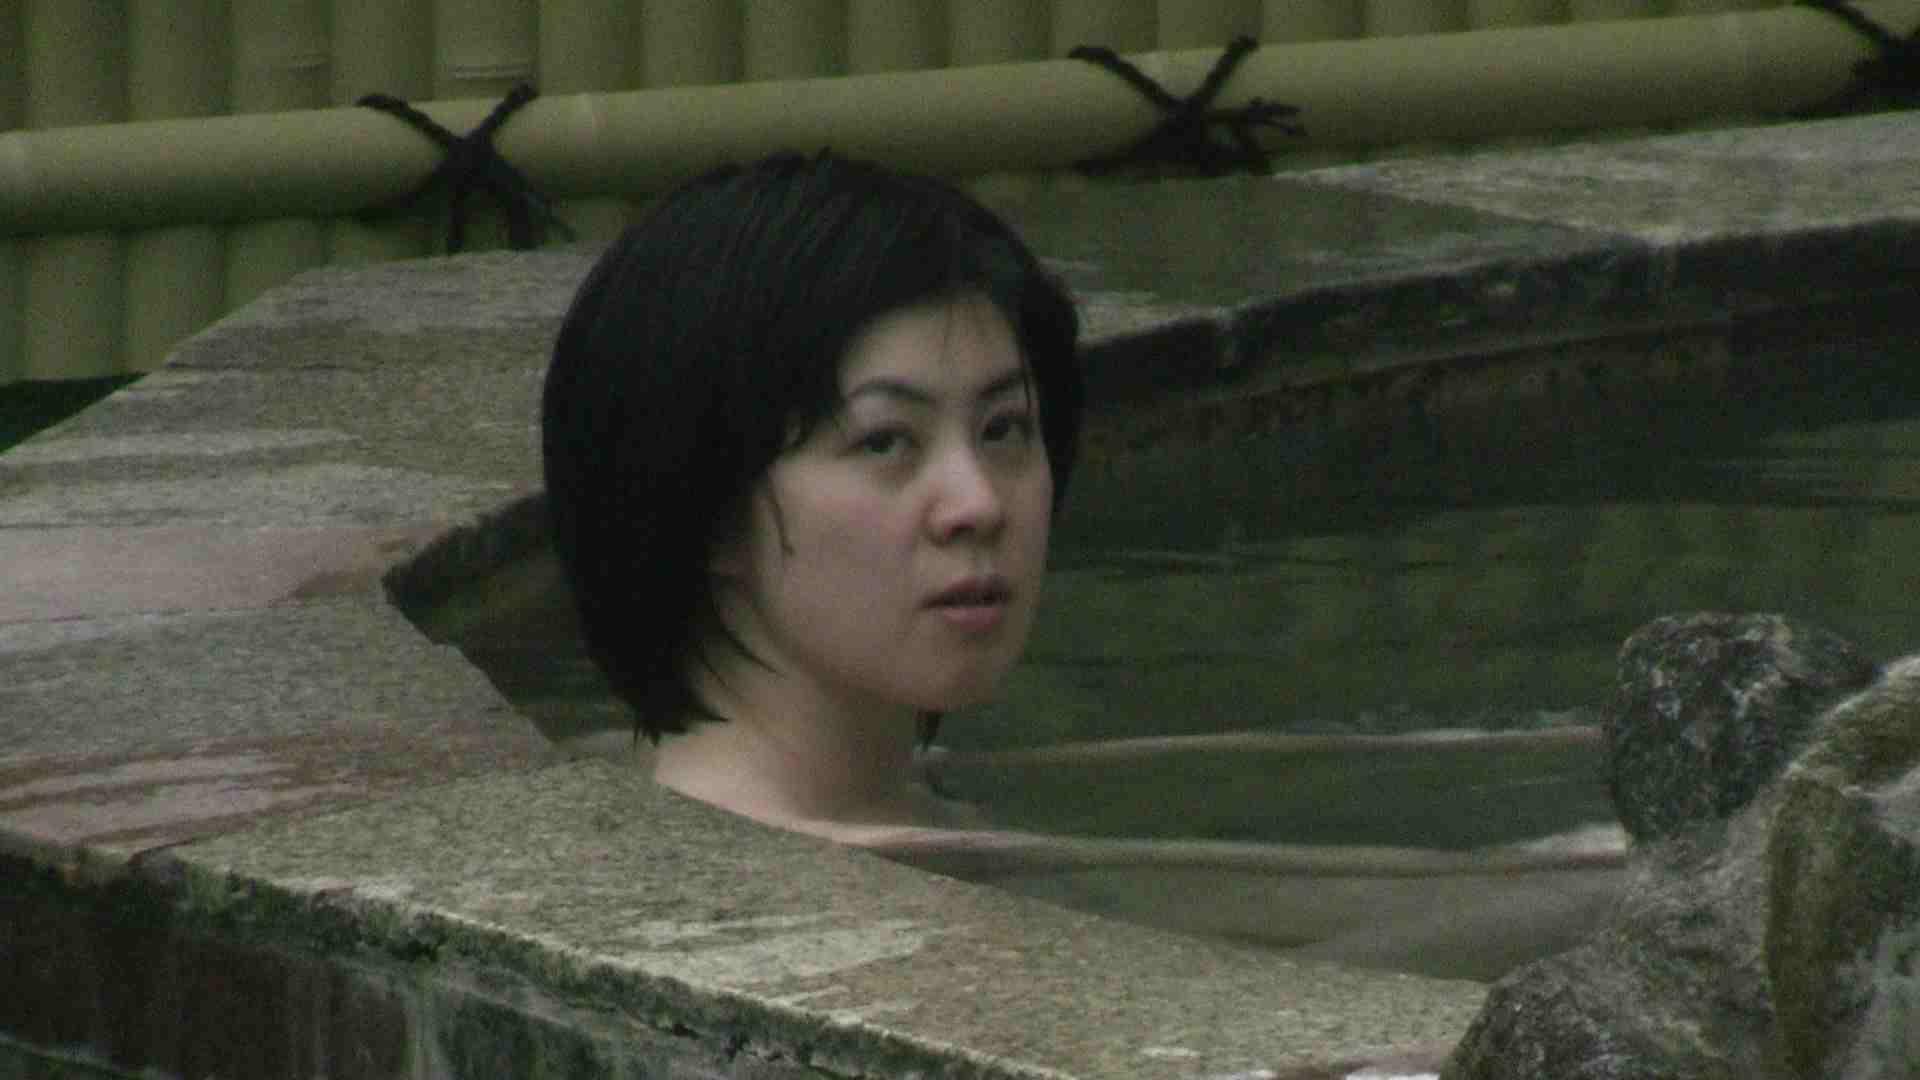 Aquaな露天風呂Vol.685 露天風呂突入 | 盗撮師作品  88pic 79